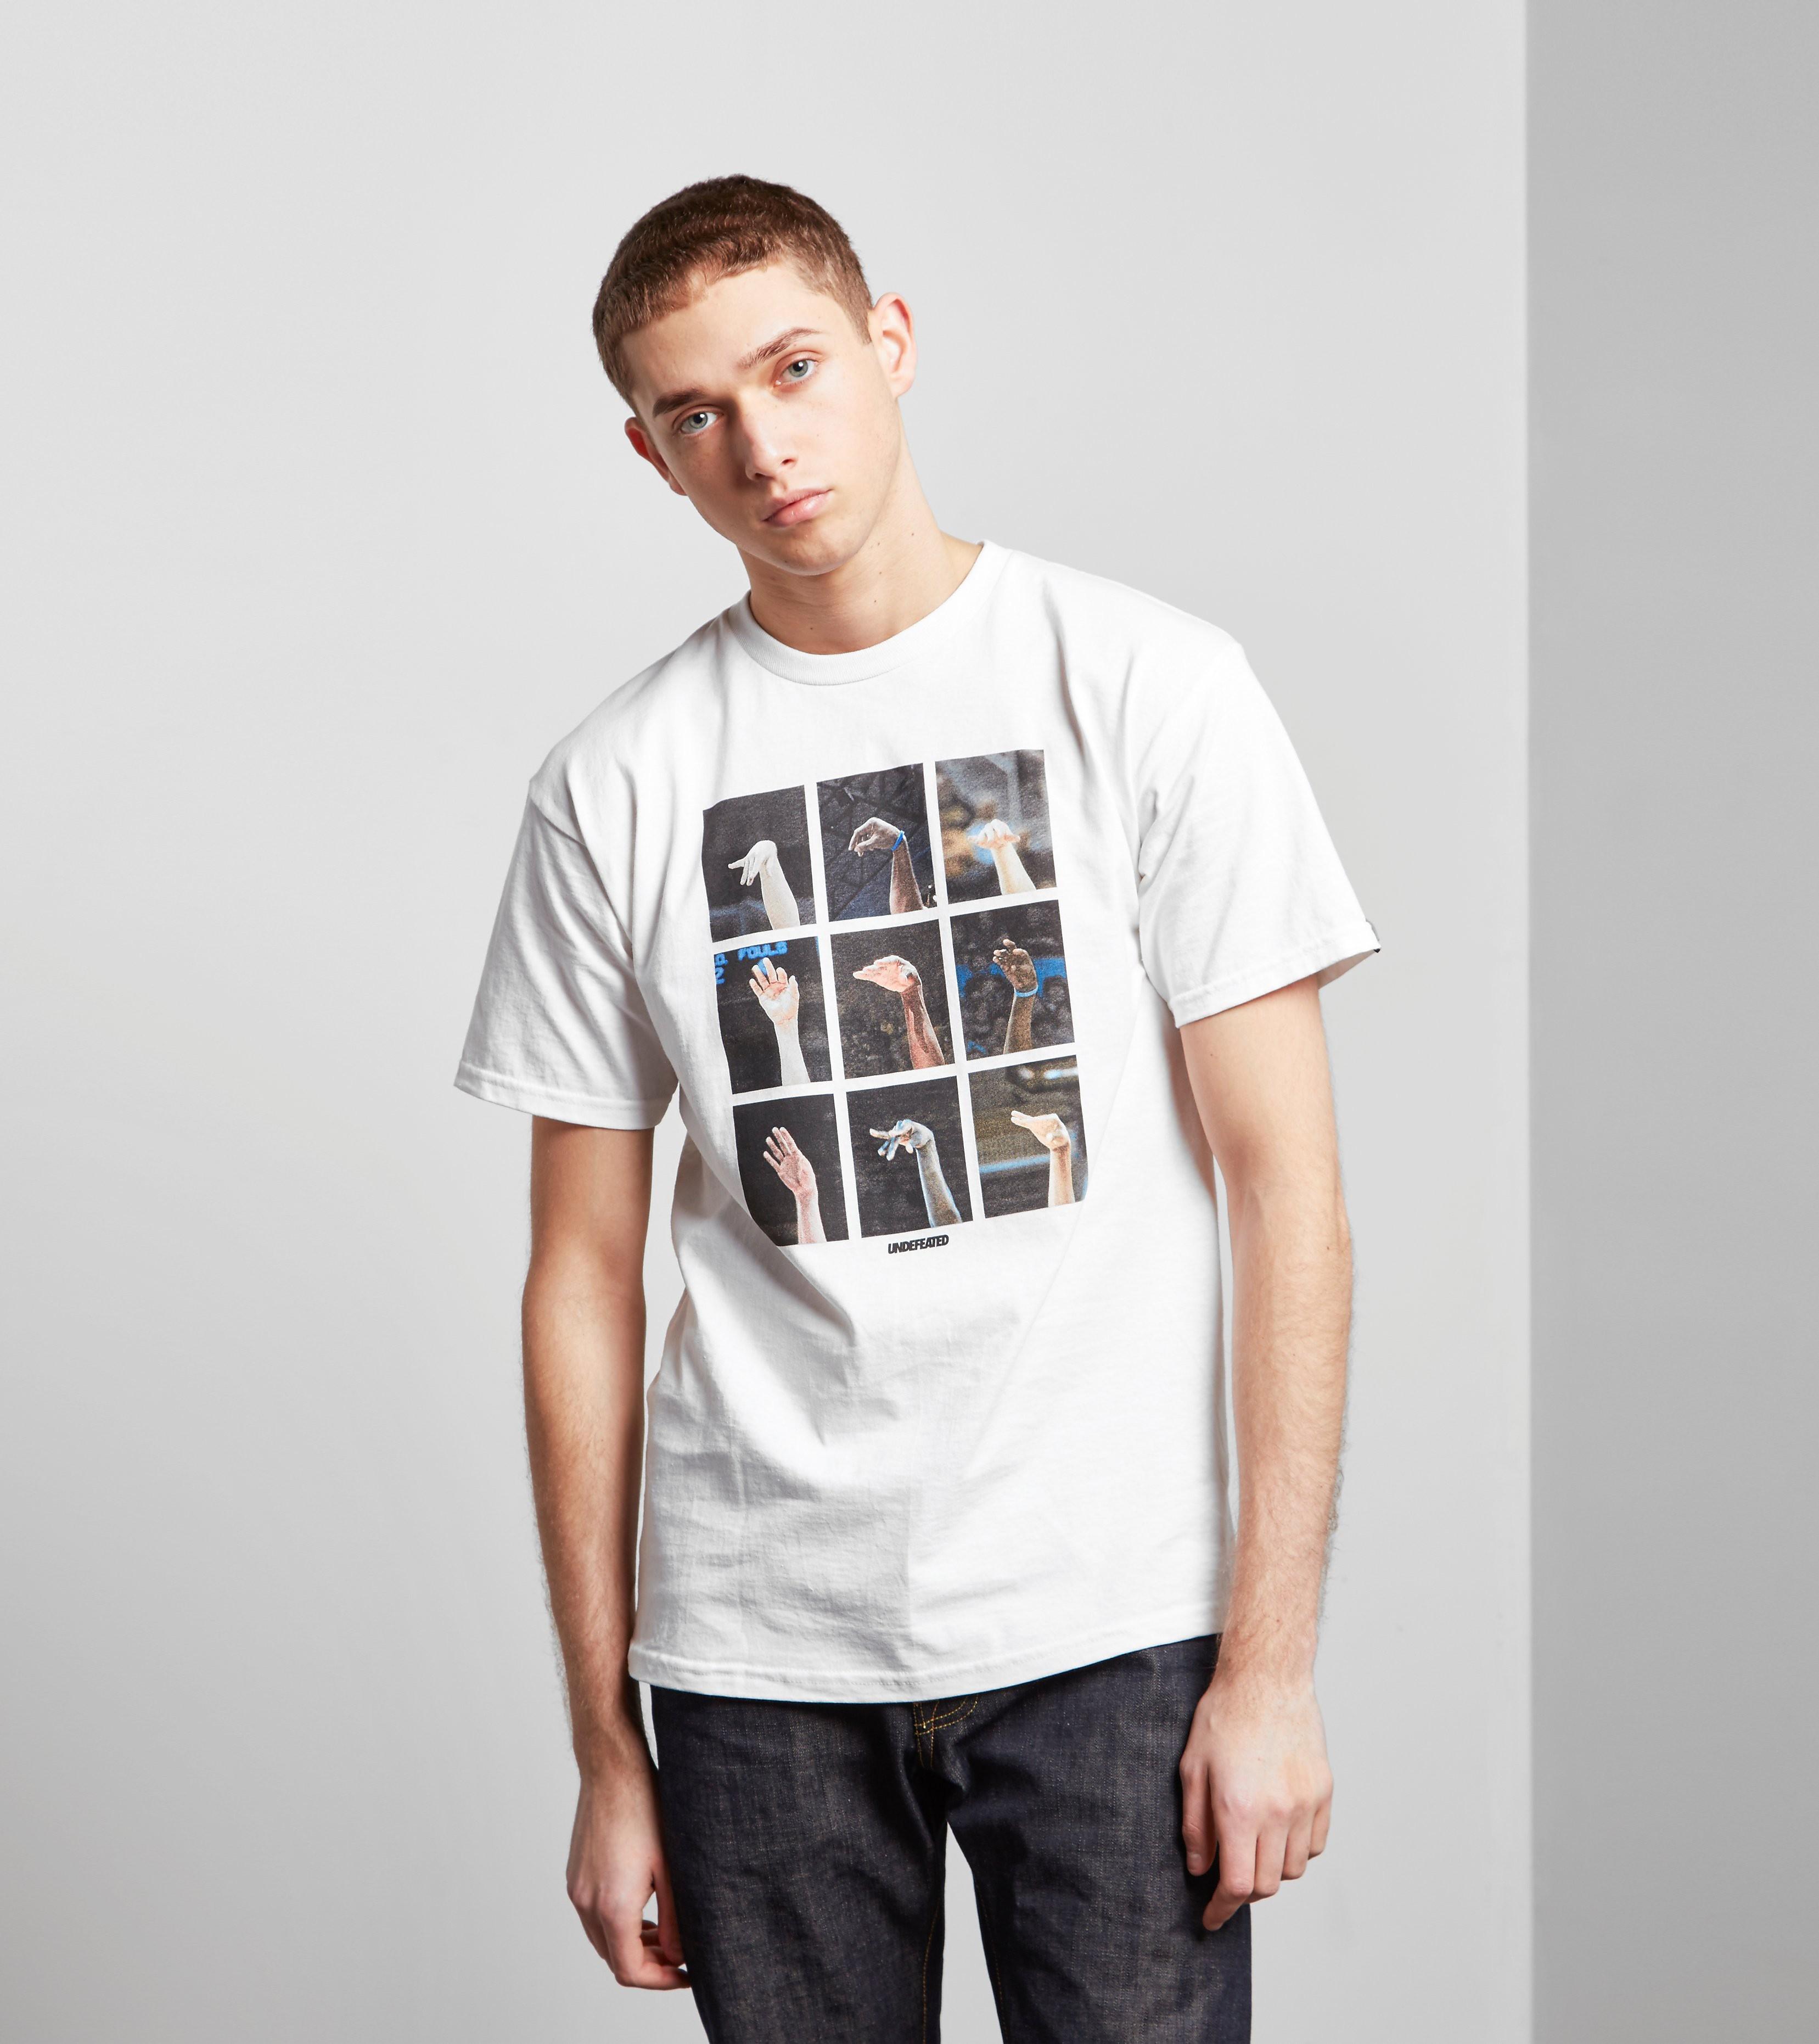 Undefeated Follow Through T-Shirt